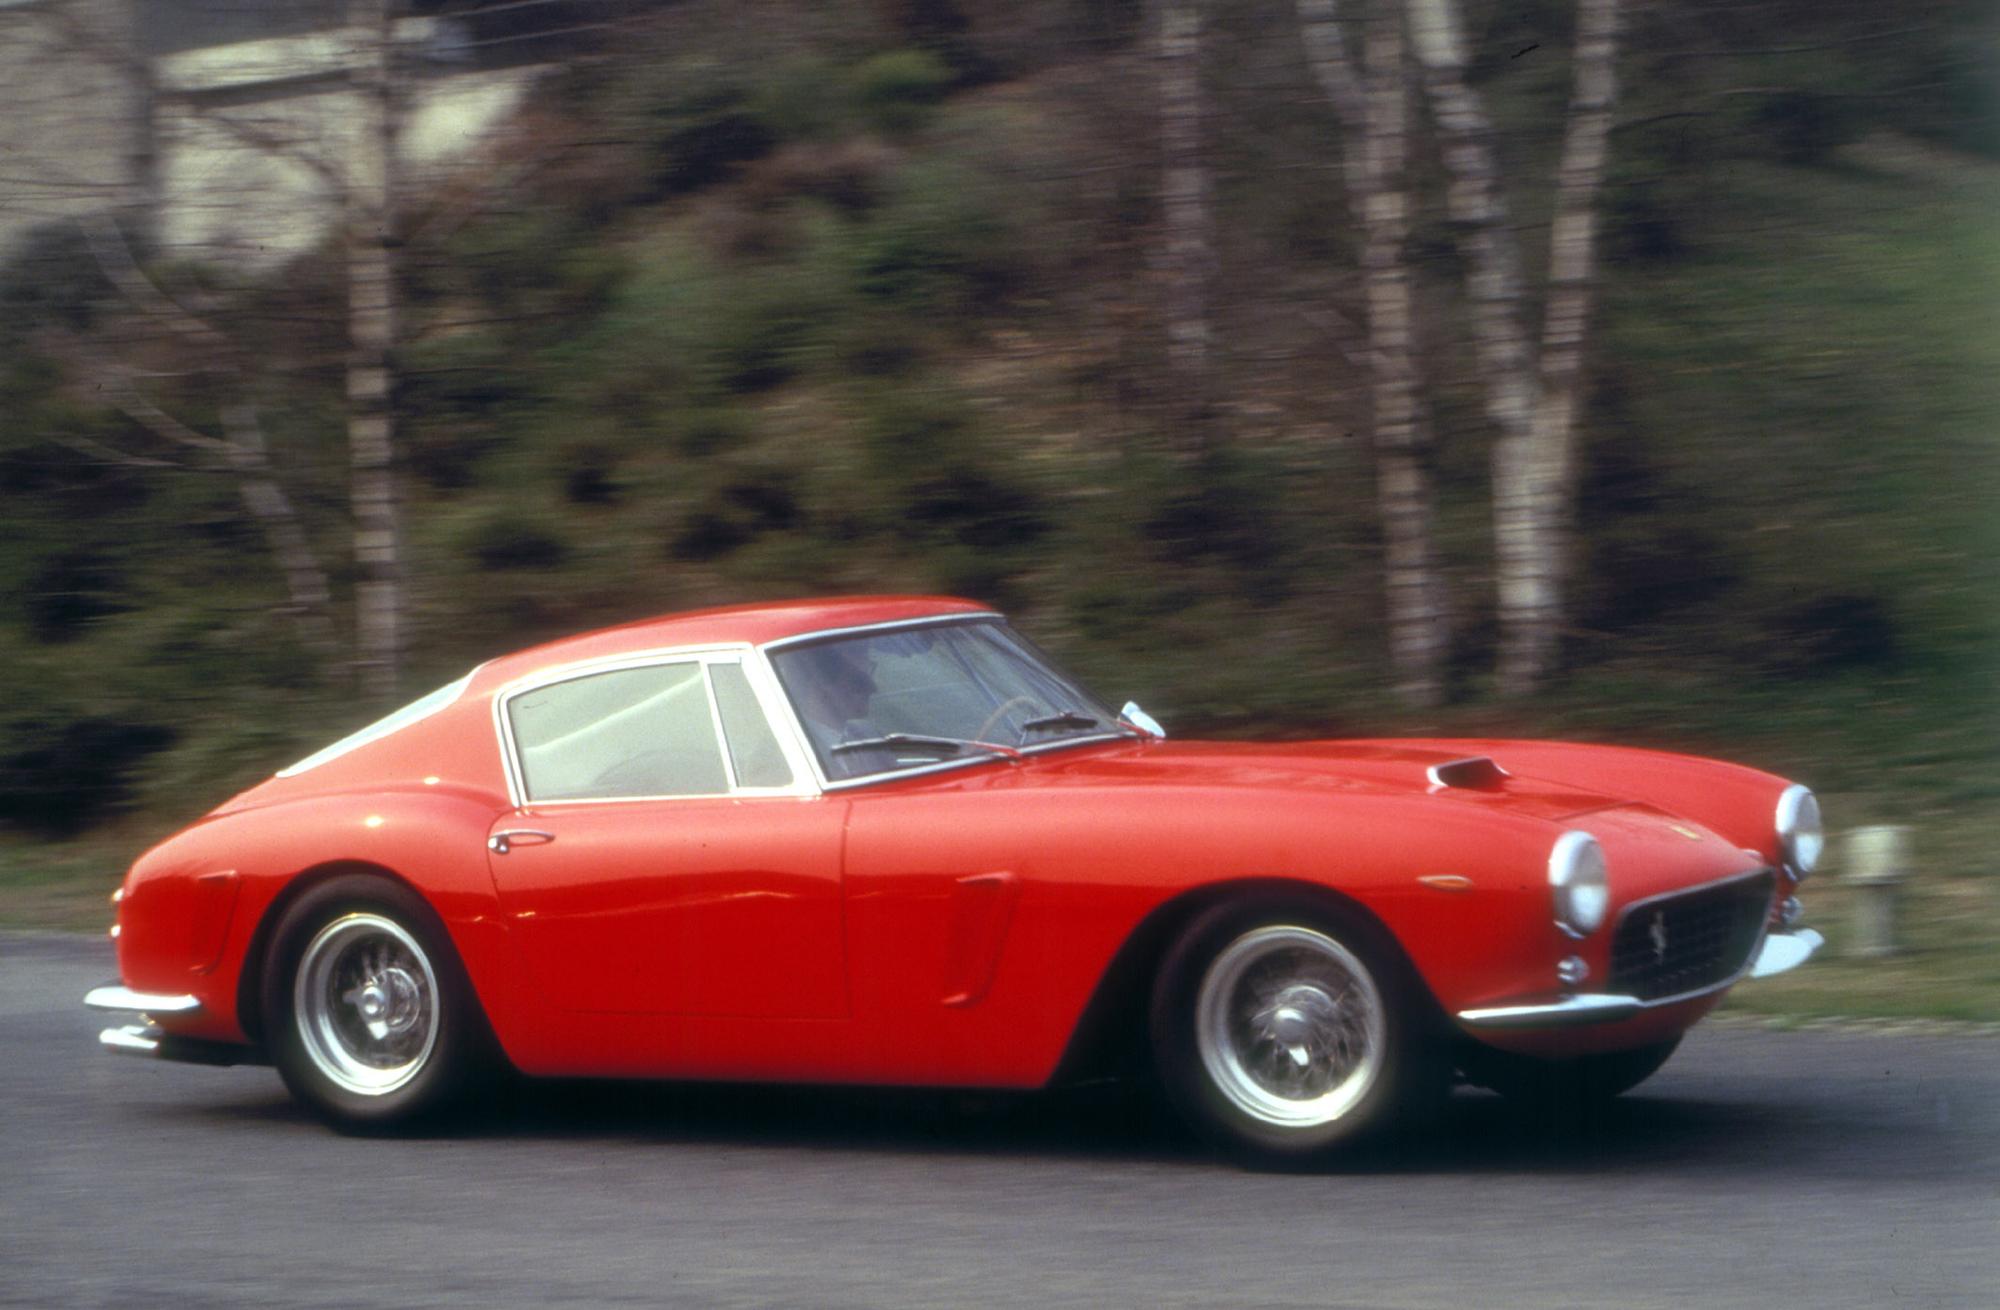 Ferrari 250 GT Berlinetta (Short Wheel Base) PF 840a, 1961.Foto: Pininfarina